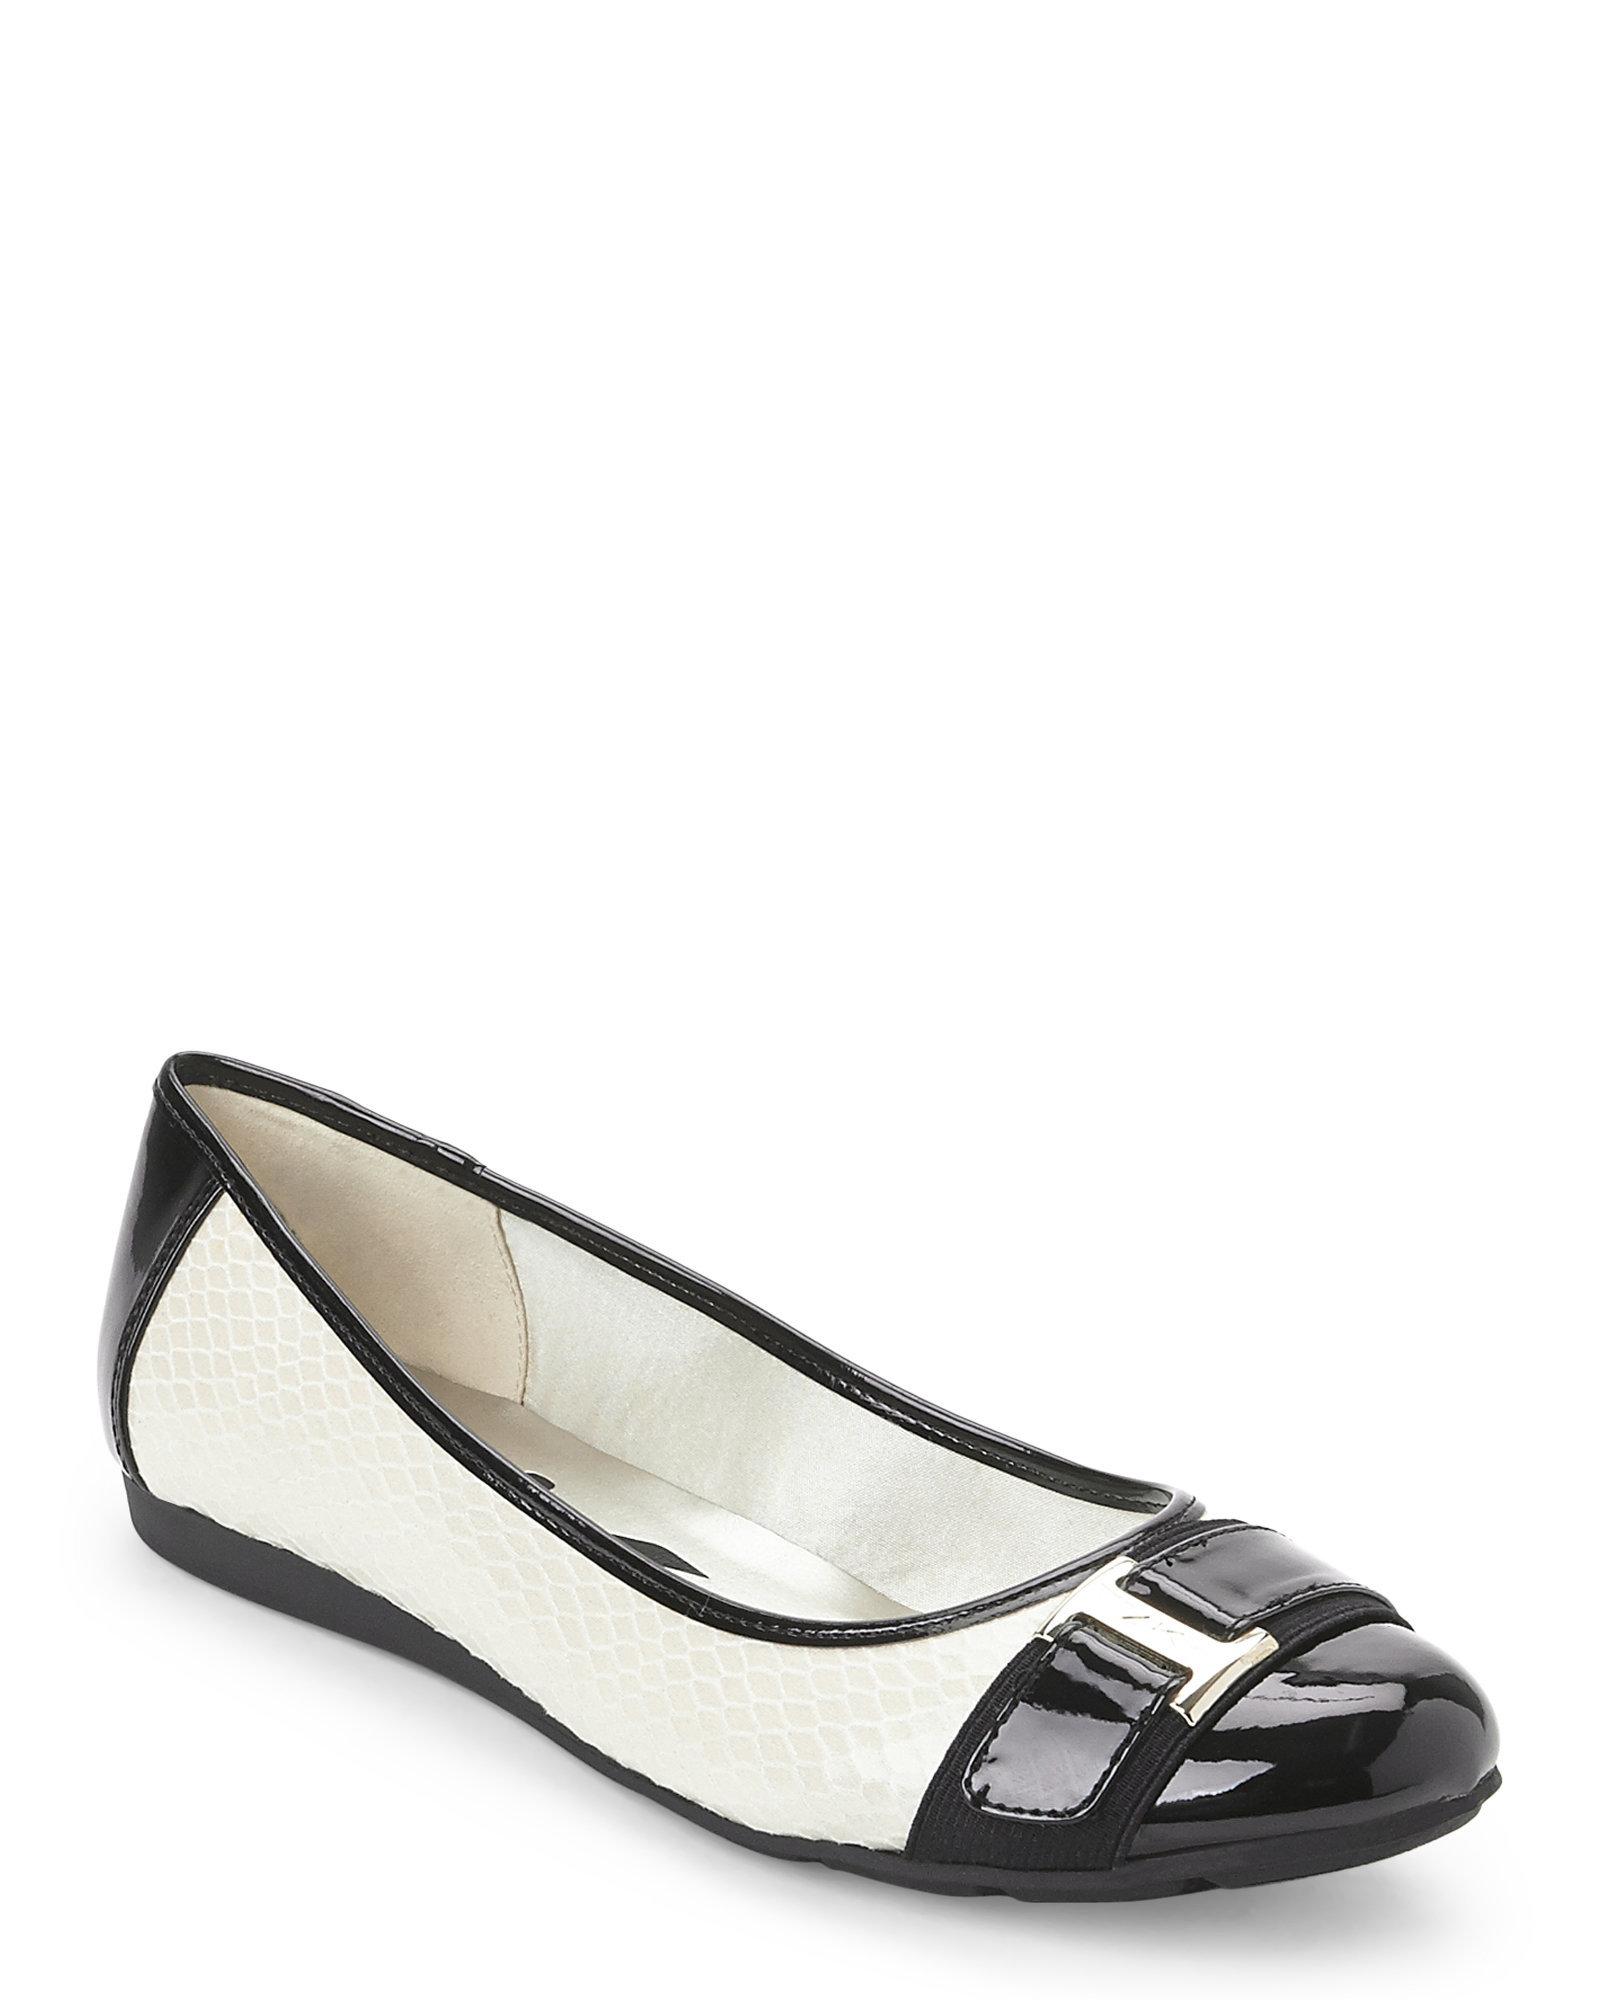 5f77c7f65ca Lyst - Ak Anne Klein Vanilla Cream   Black Appeal Flats in Black